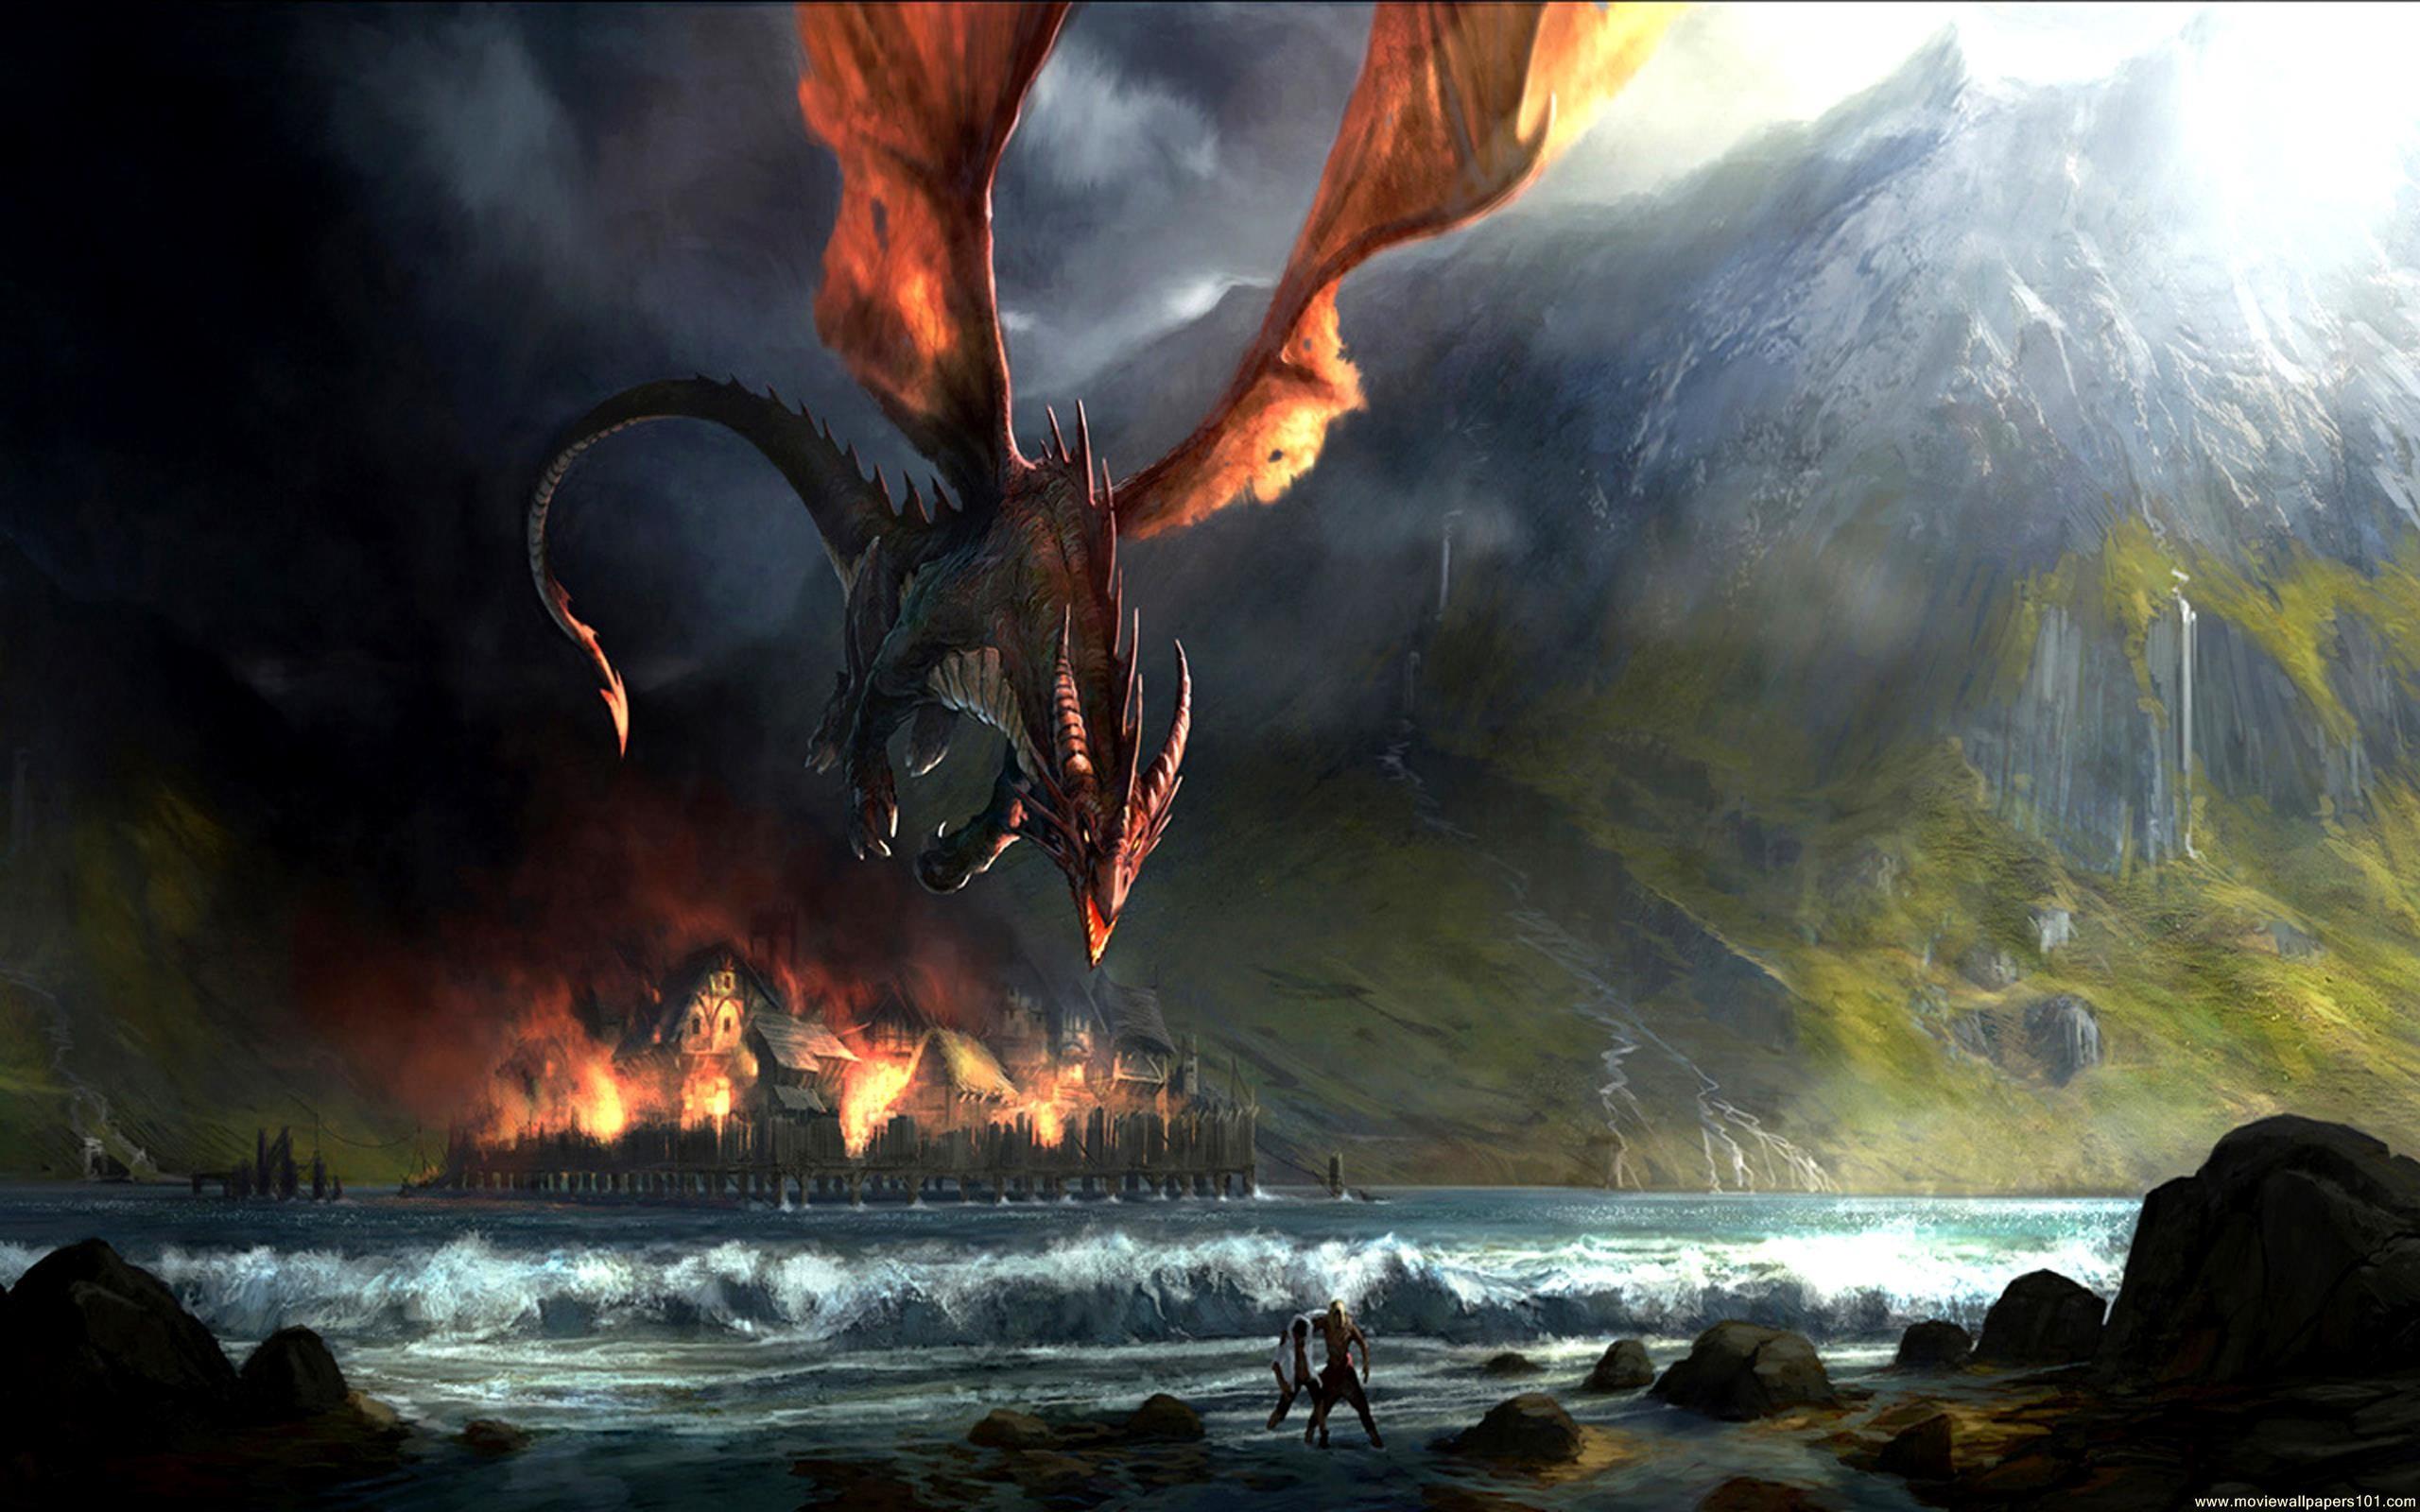 The Hobbit: The Desolation of Smaug wallpaper – (1280×720 .